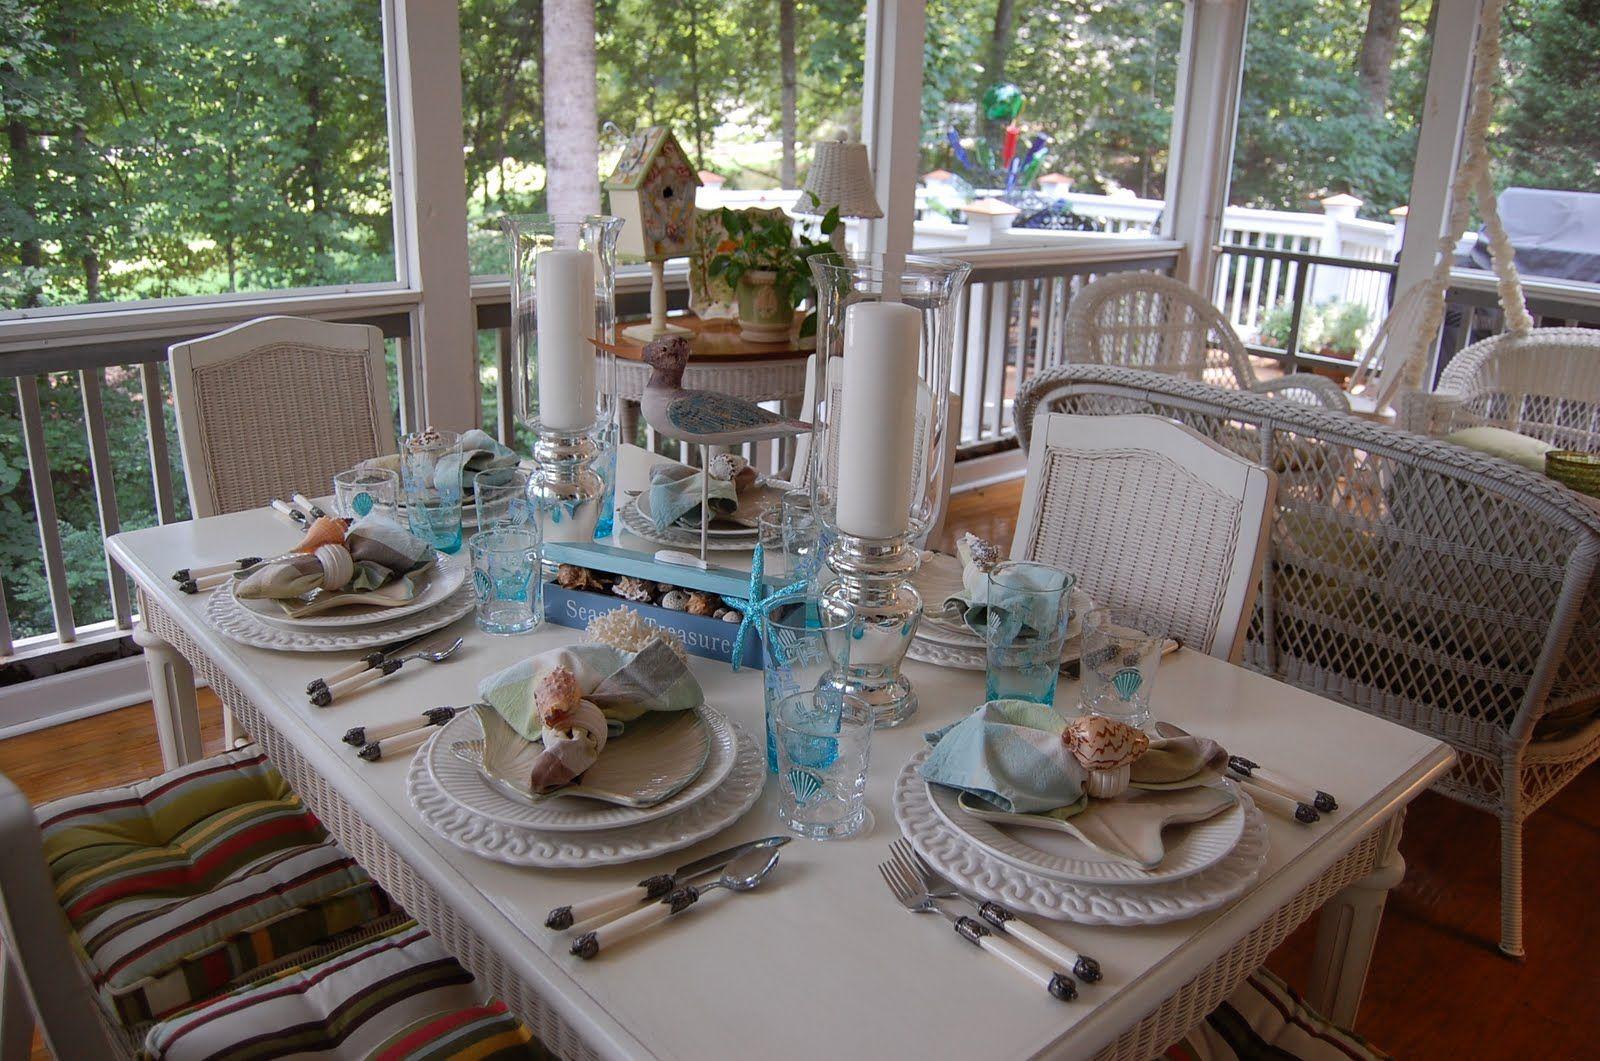 seaside table settings - Google Search & seaside table settings - Google Search | Seaside Home Decorating ...